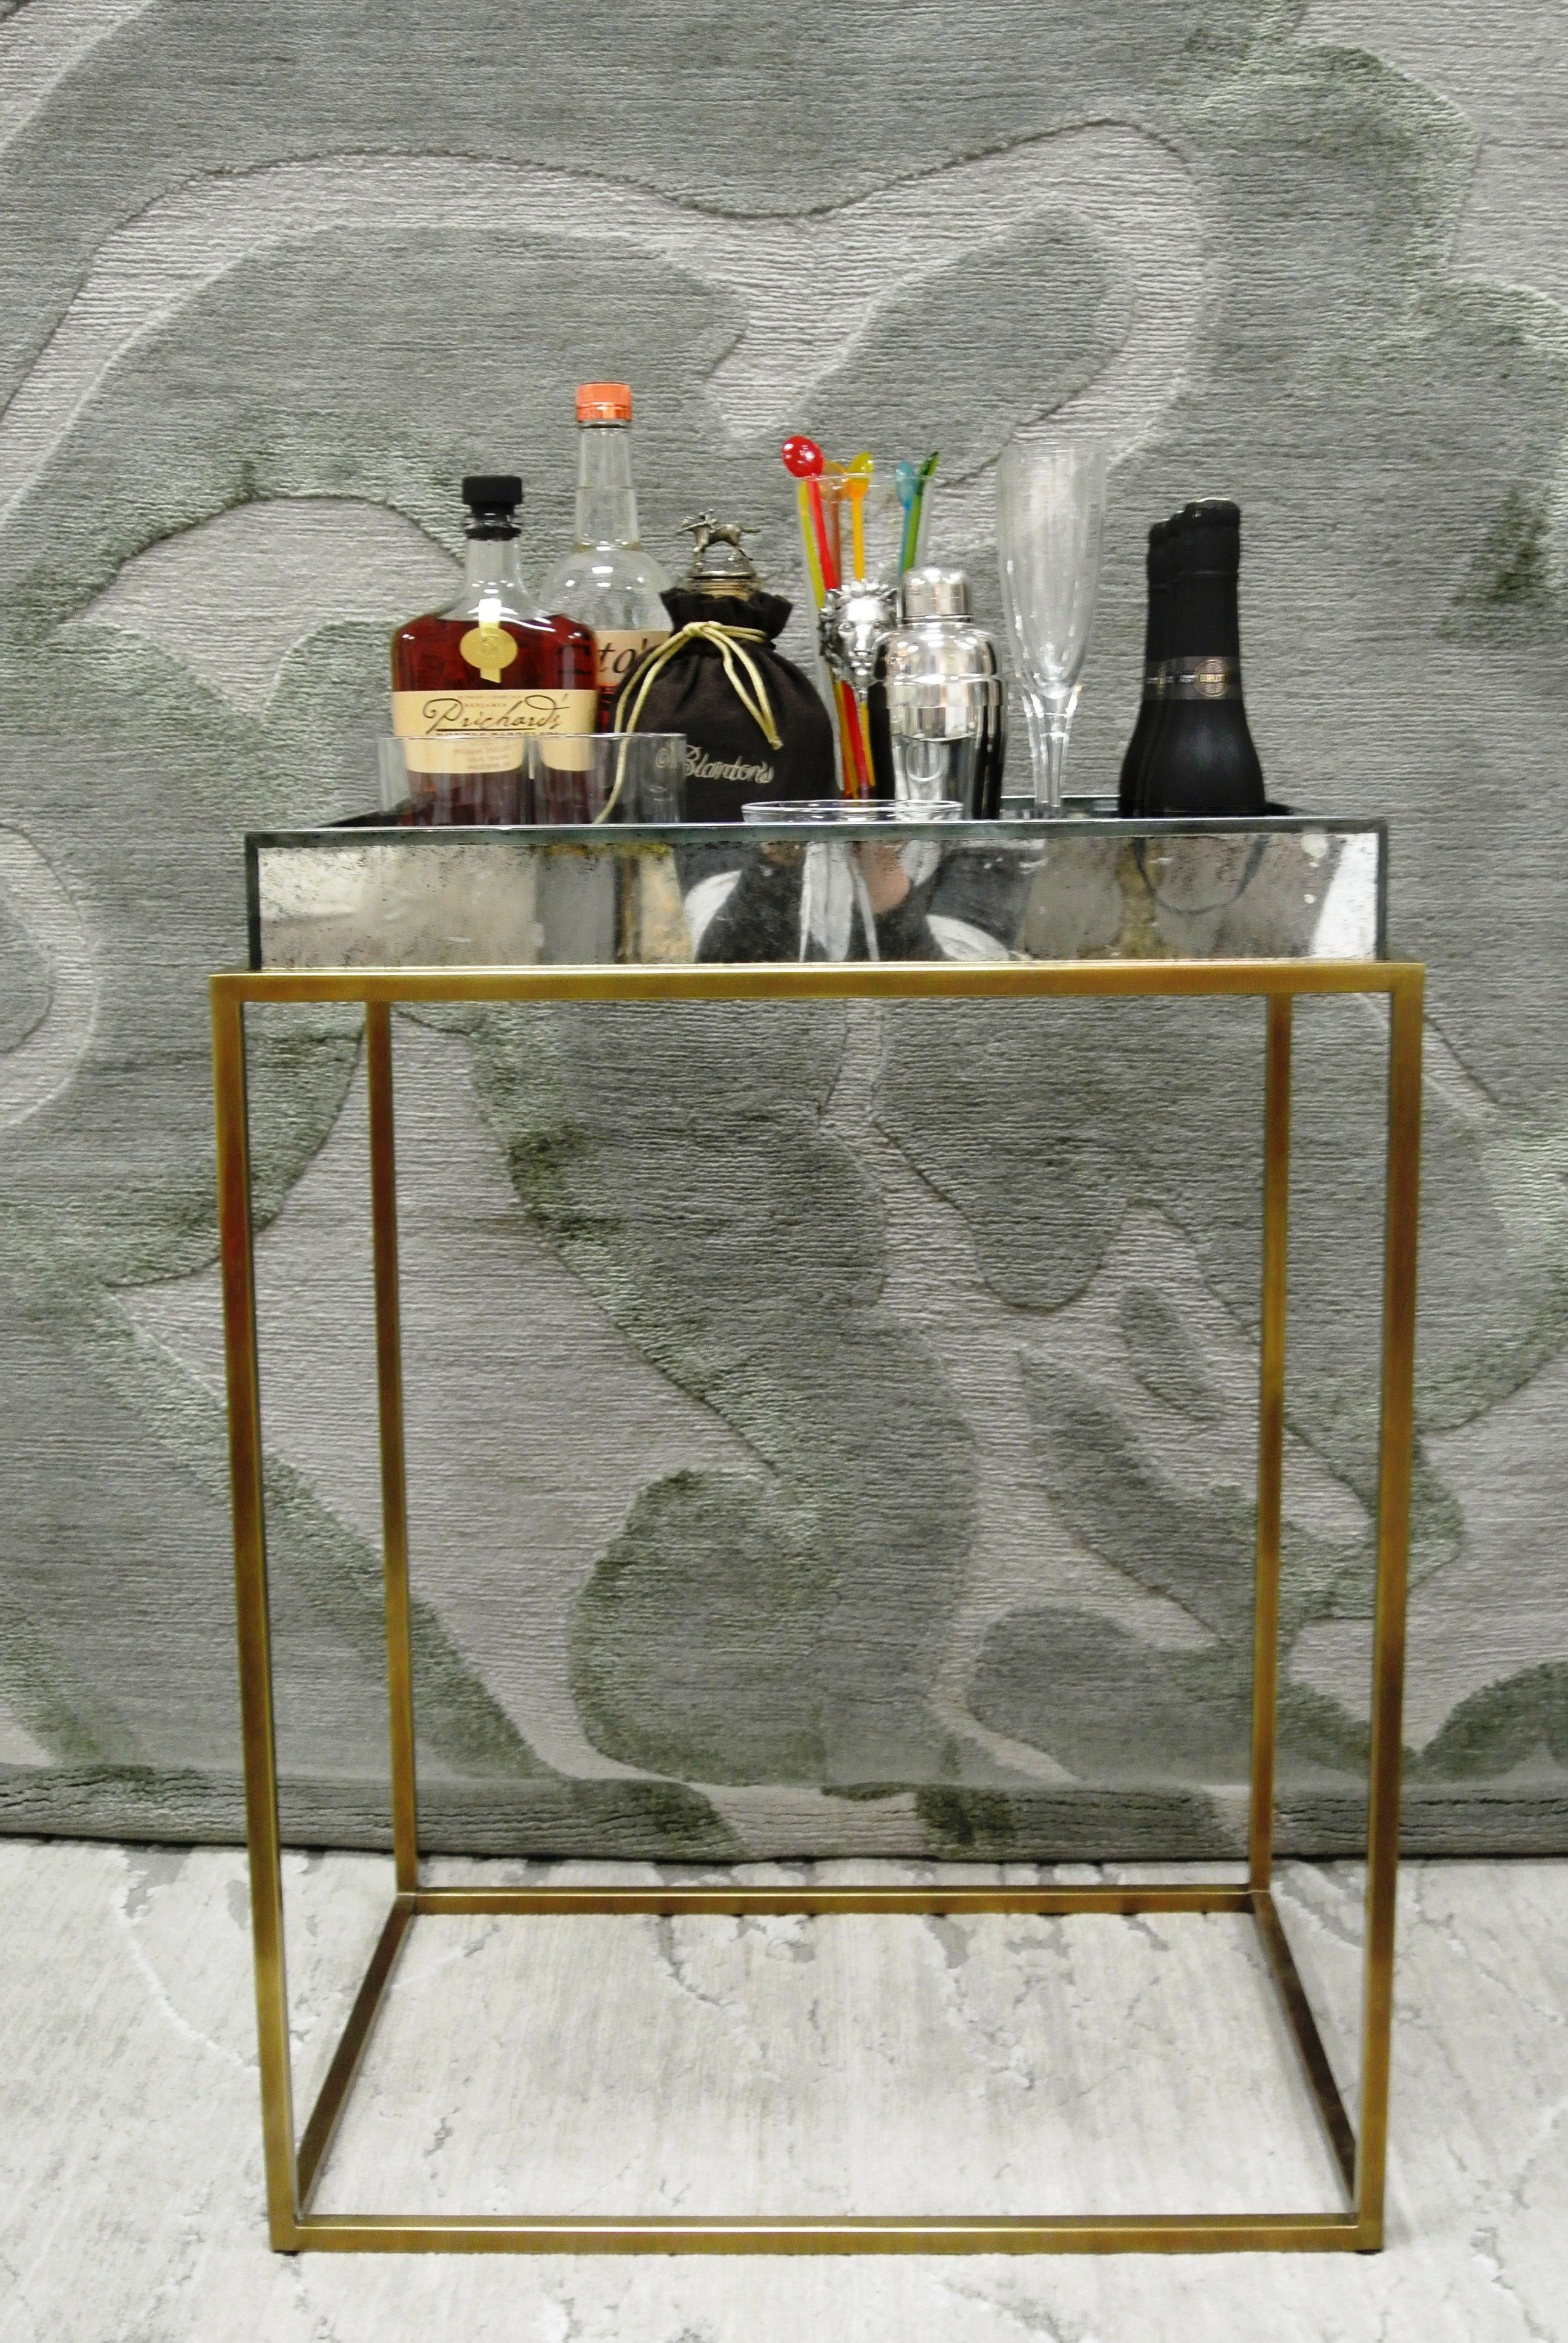 febccaedfbecd - modern tray table no bar oasis bar and bar carts